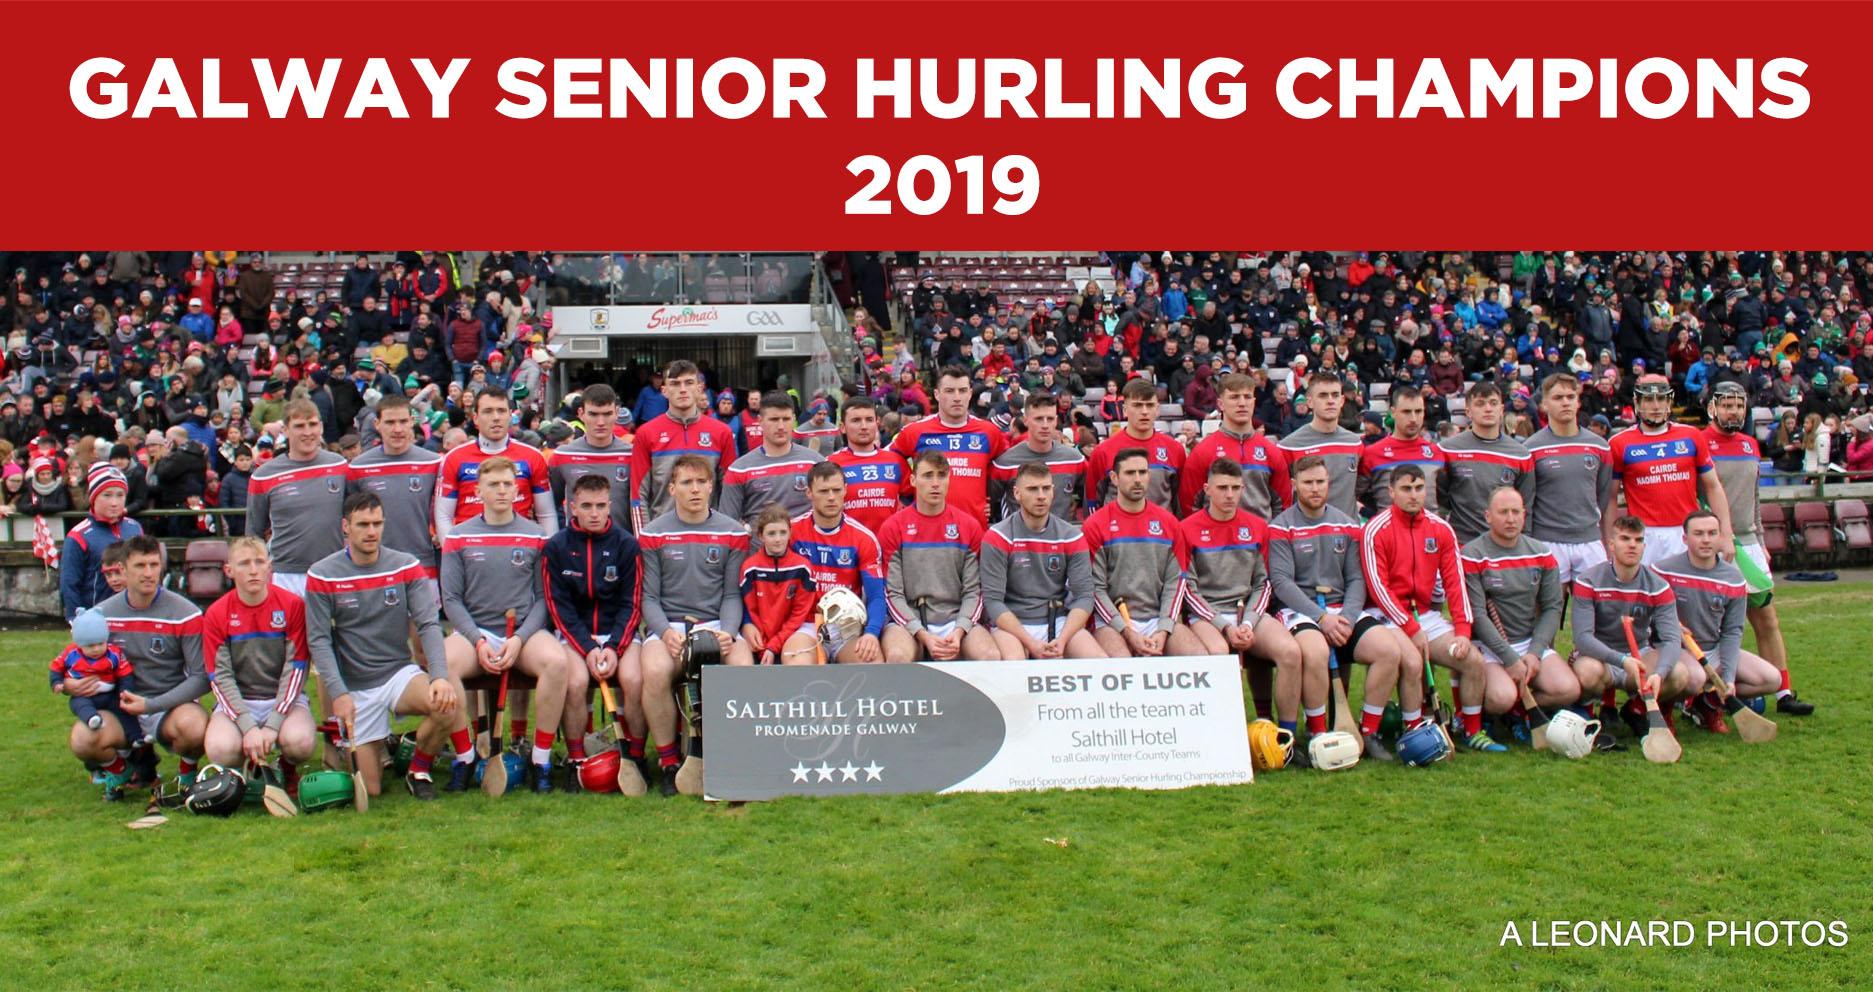 Galway Senior Hurling Champions 2018\